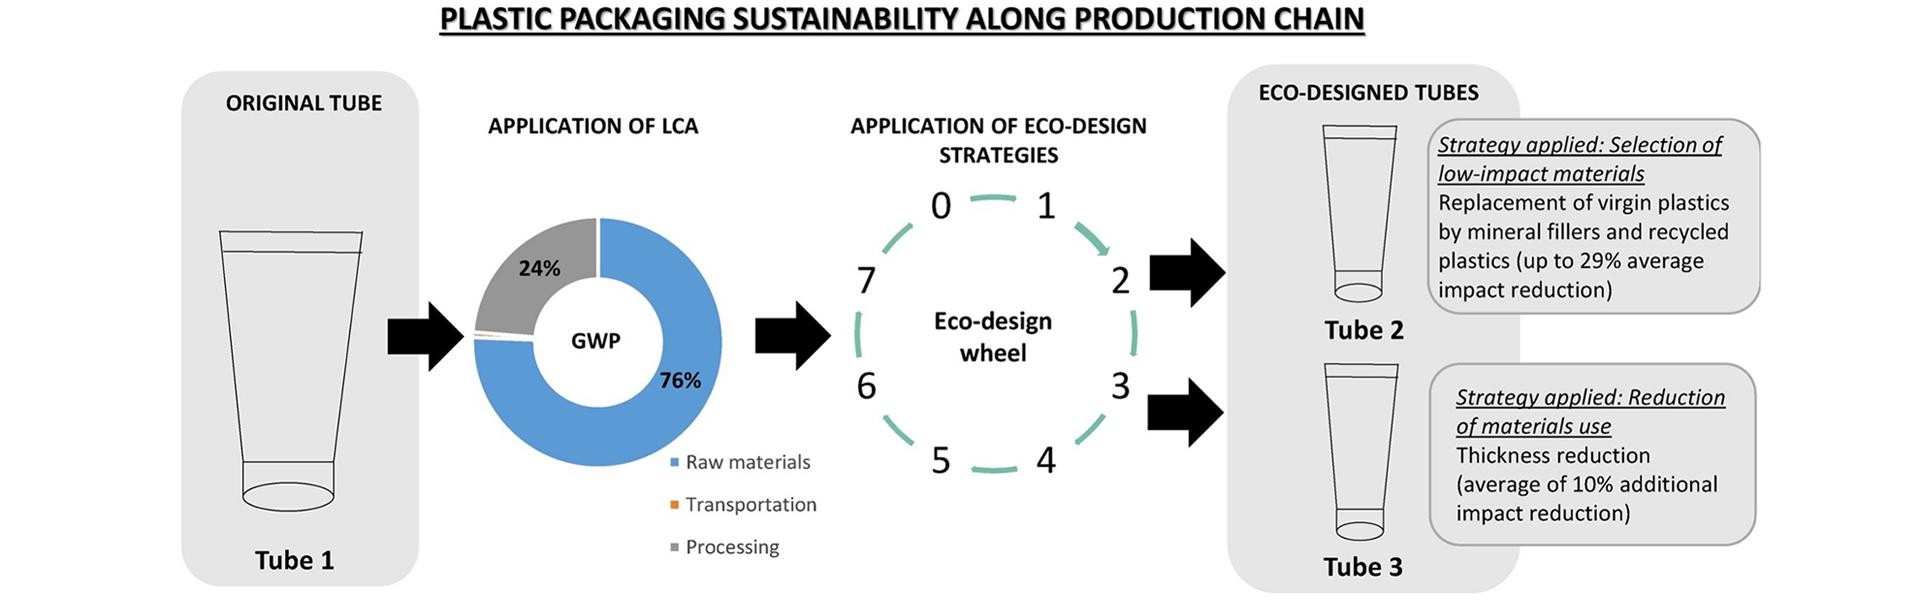 ecodesign strategy